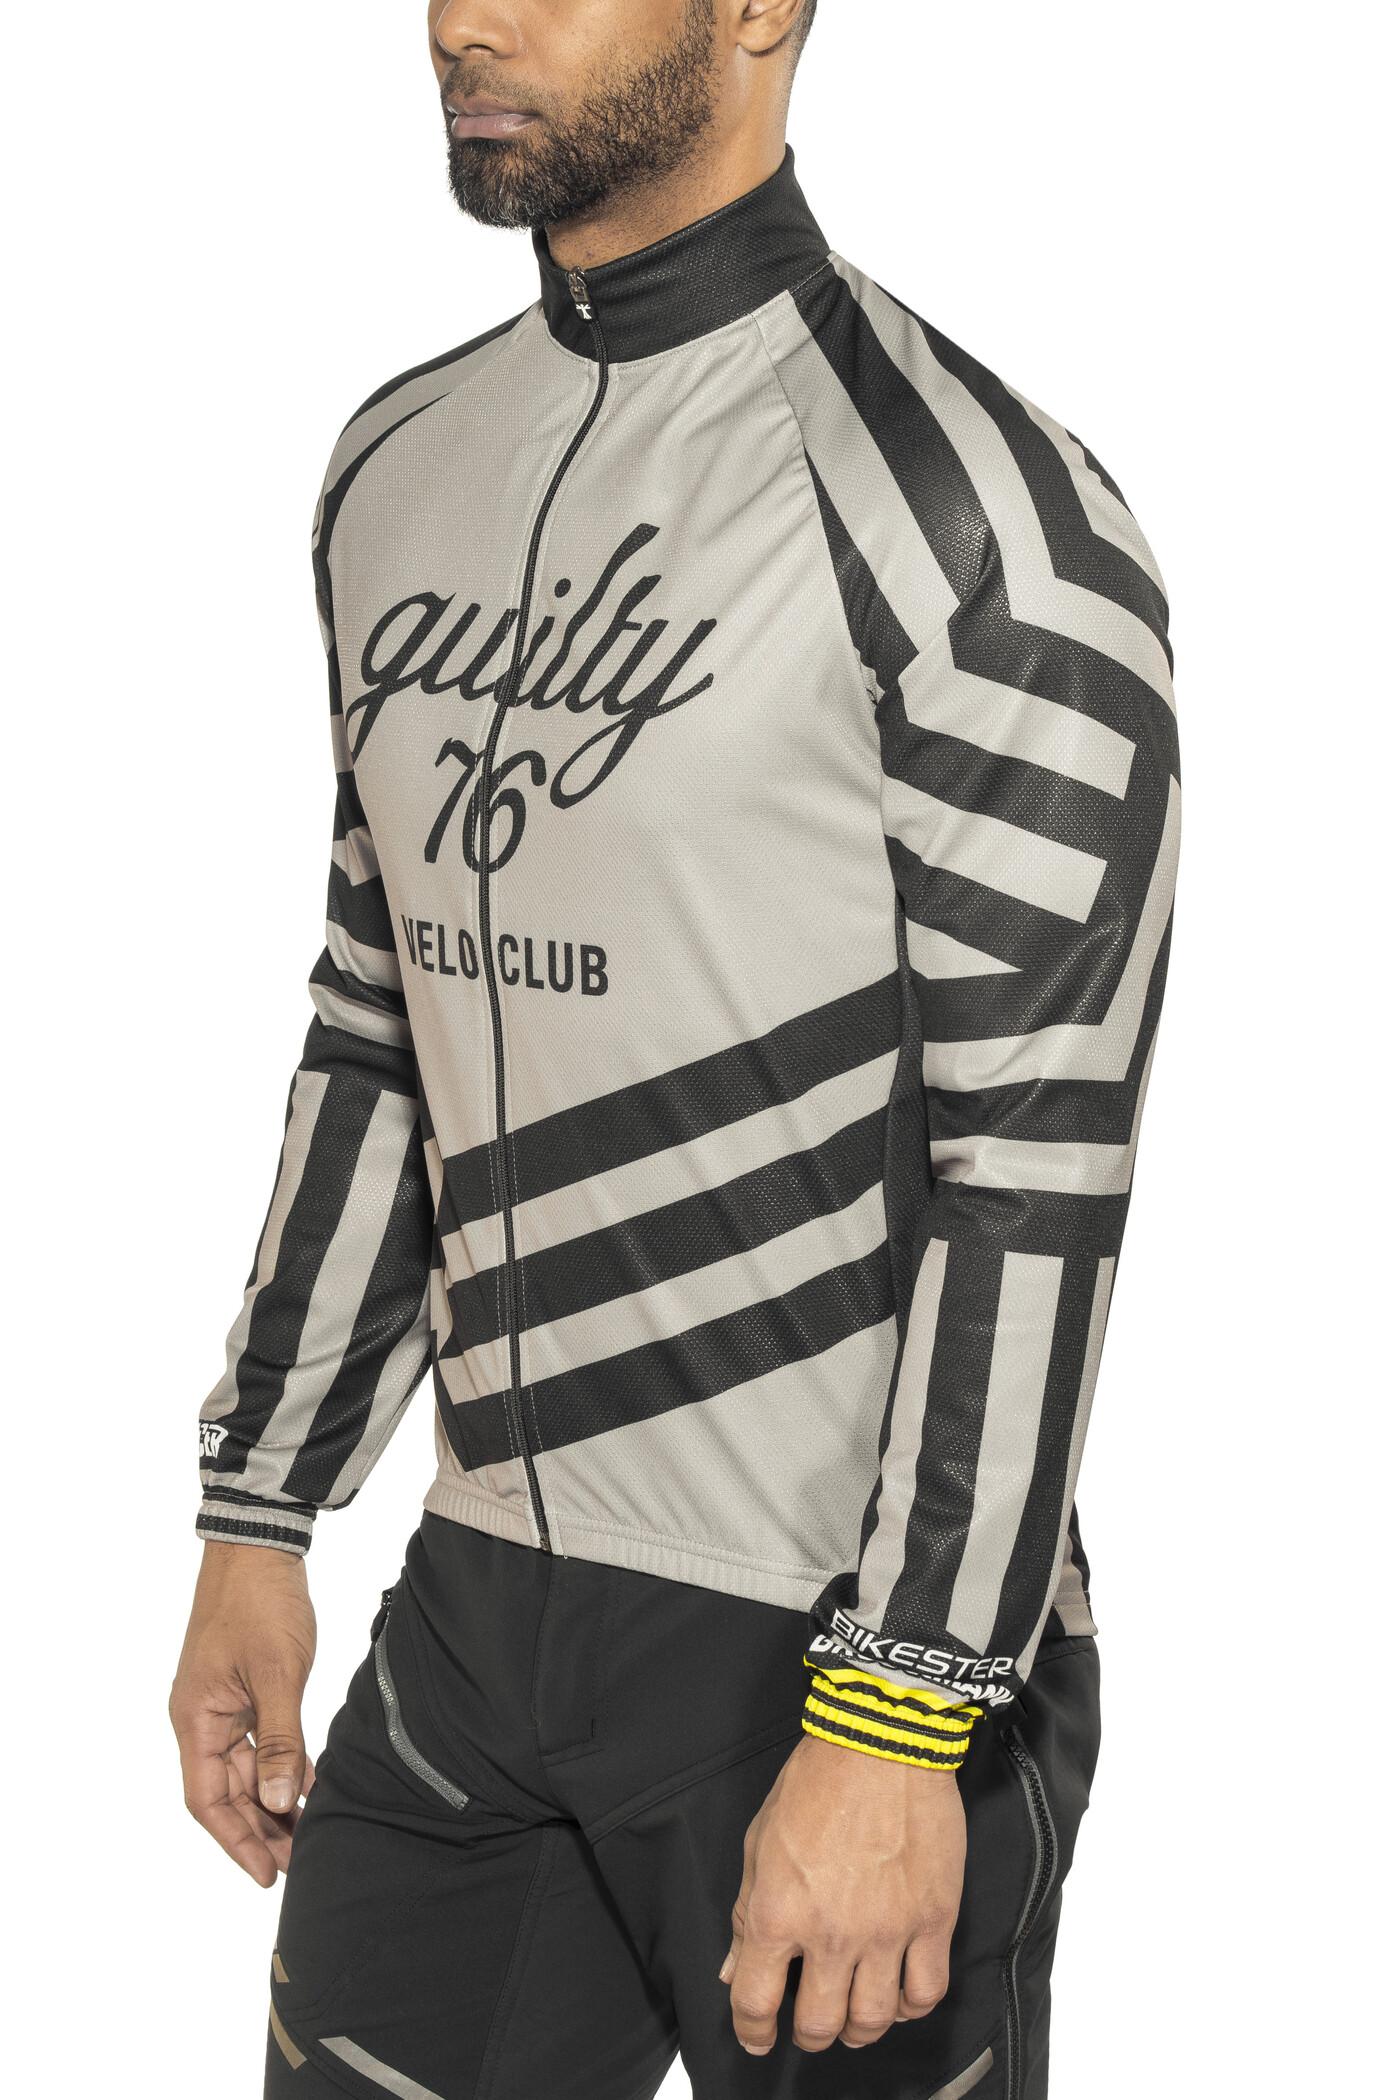 guilty 76 racing Velo Club Pro Race Vindjakke, grey (2019)   Jackets